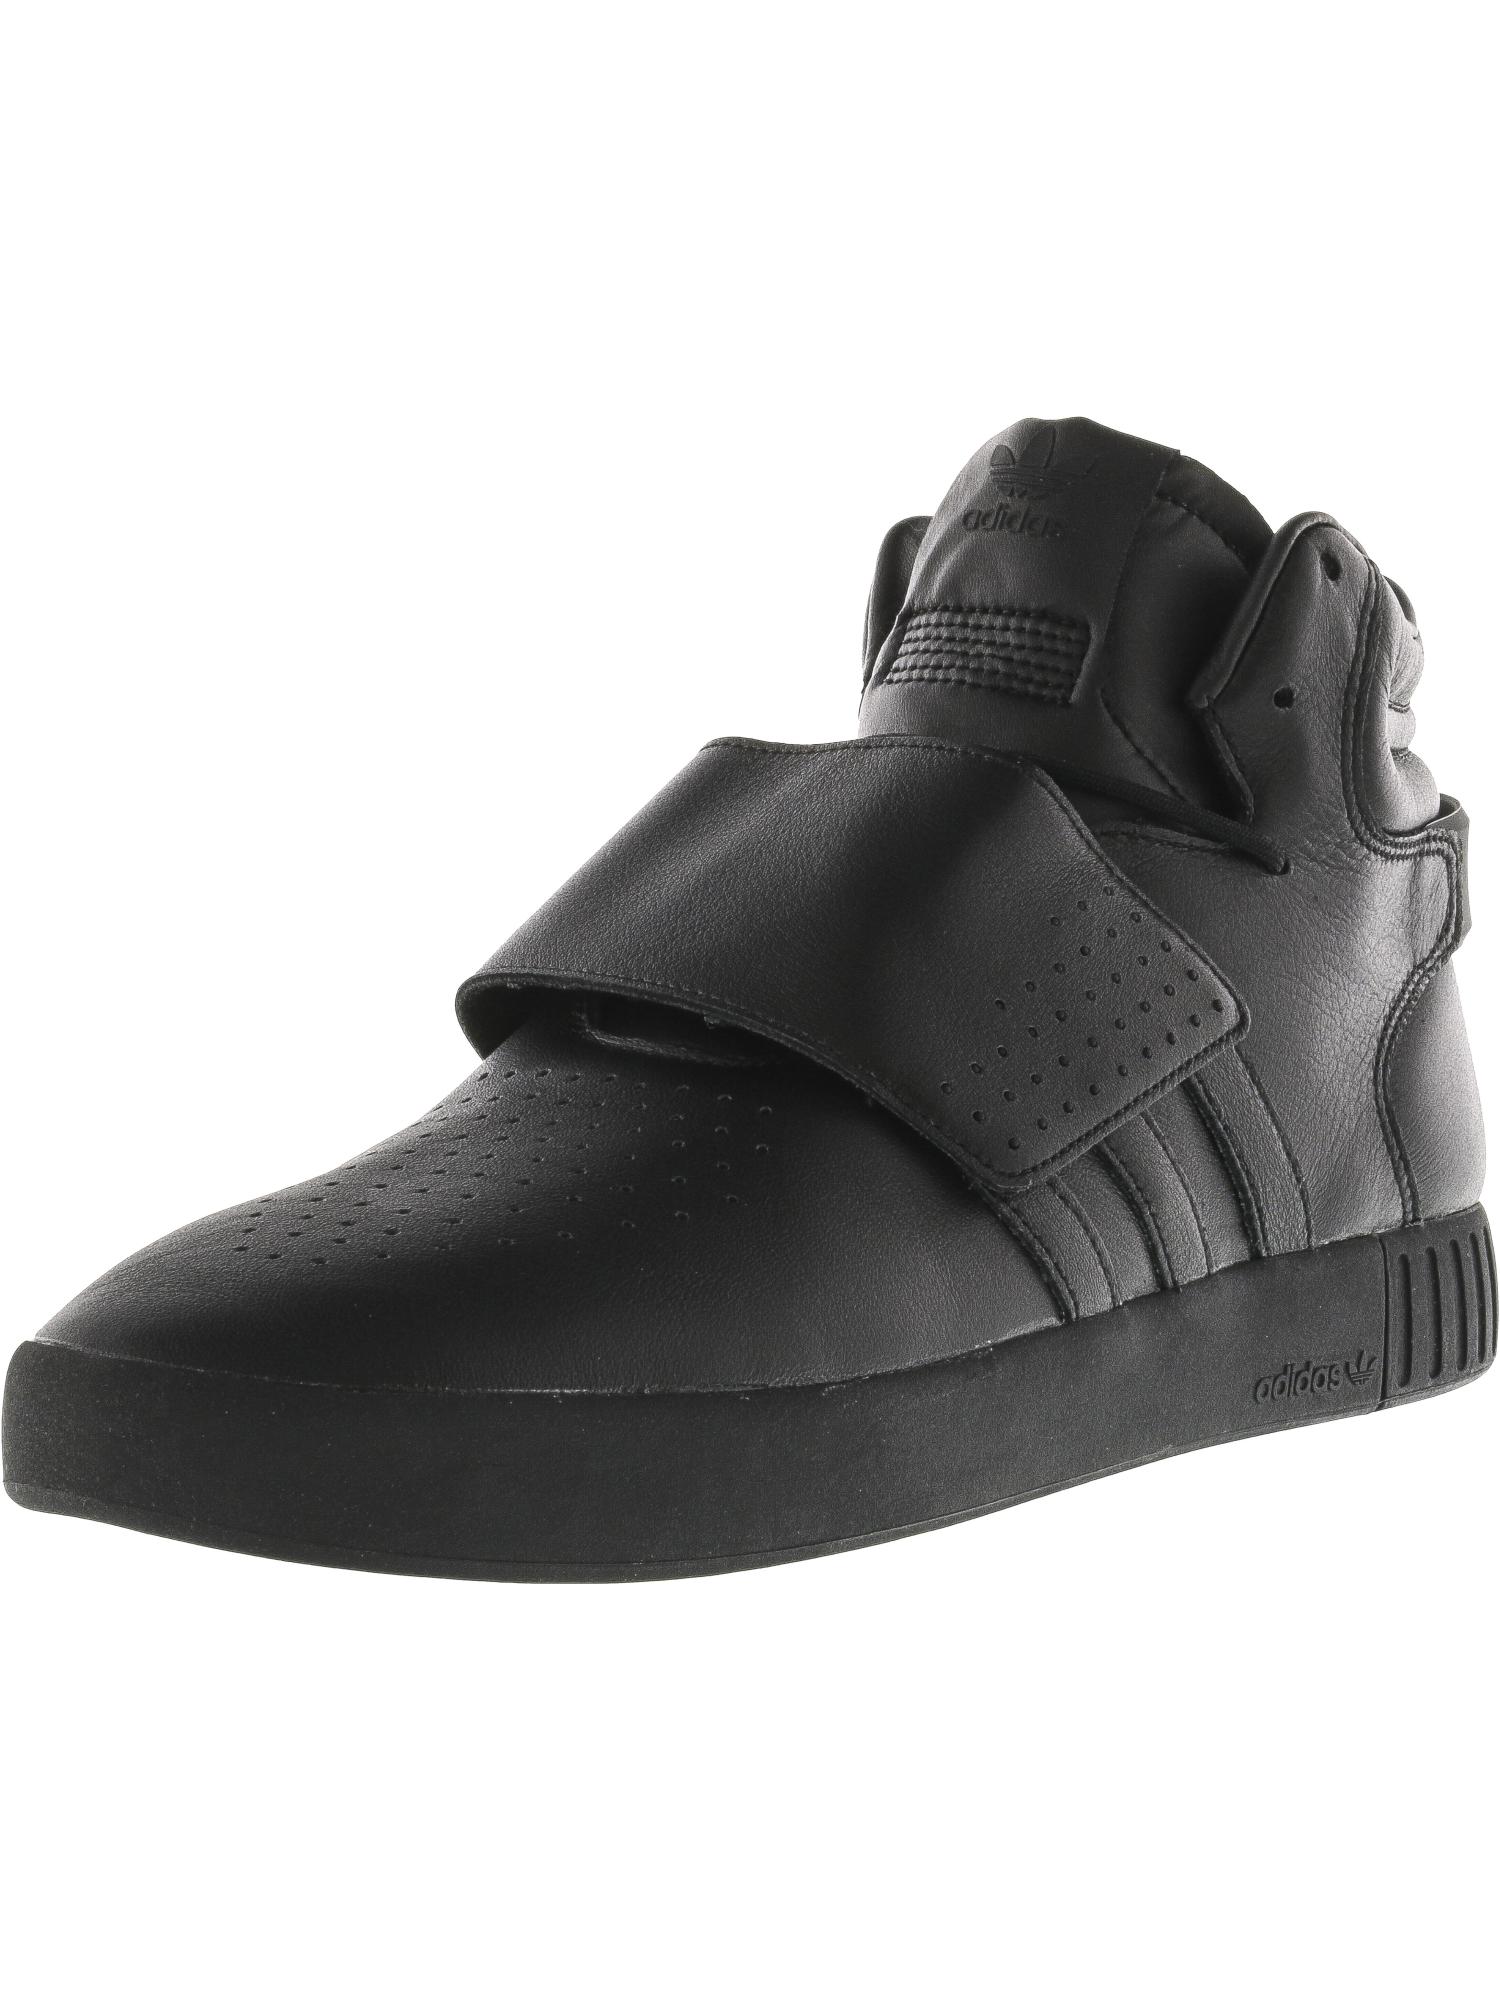 Men's adidas Originals Tubular Invader Strap Chaussures Bw0871 Noir US